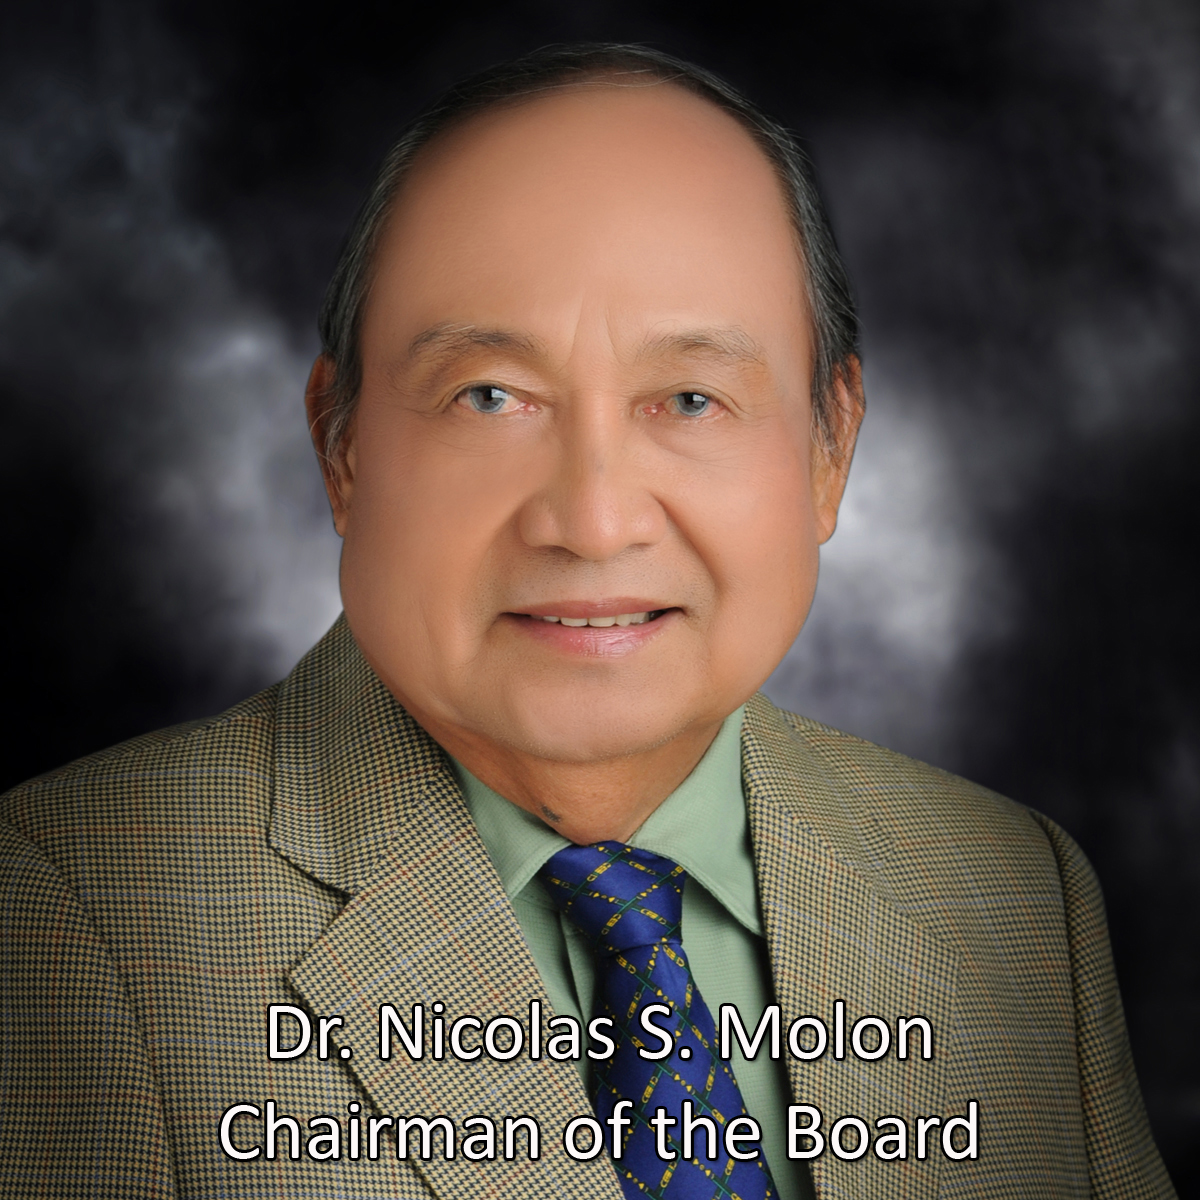 001DrNicolasMolon_ChairmanoftheBoard